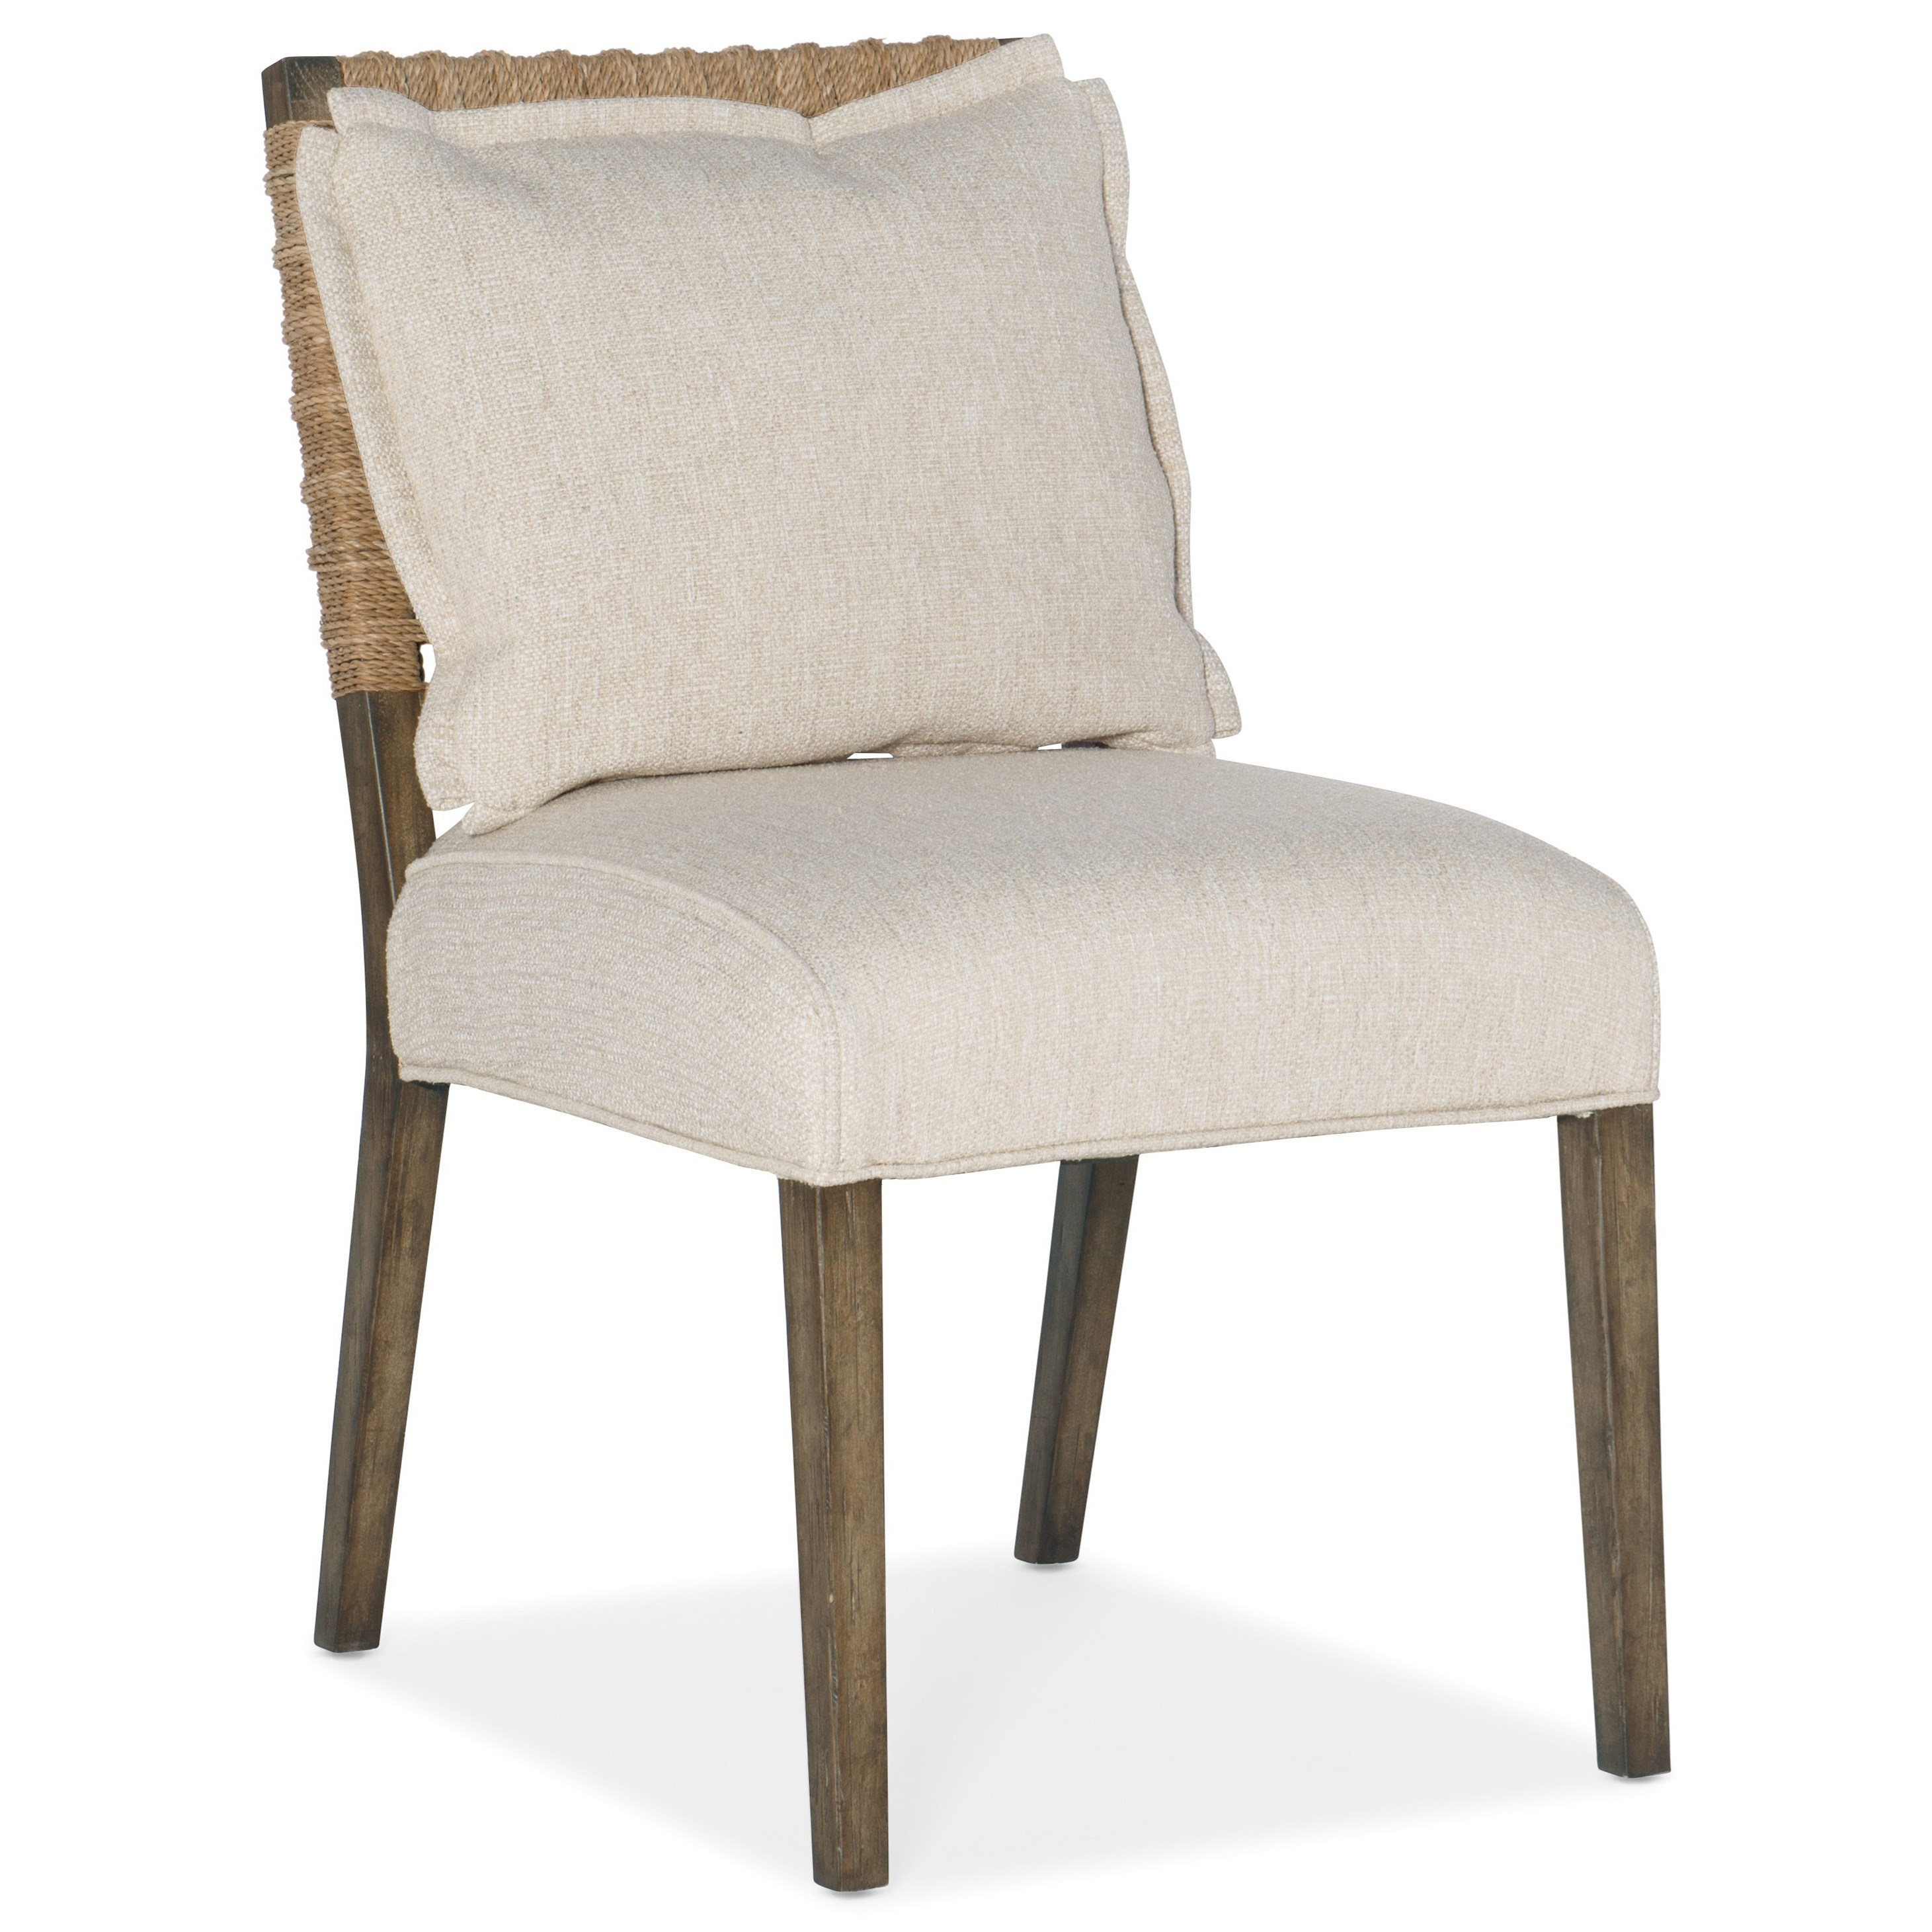 Sundance Side Chair by Hooker Furniture at Baer's Furniture